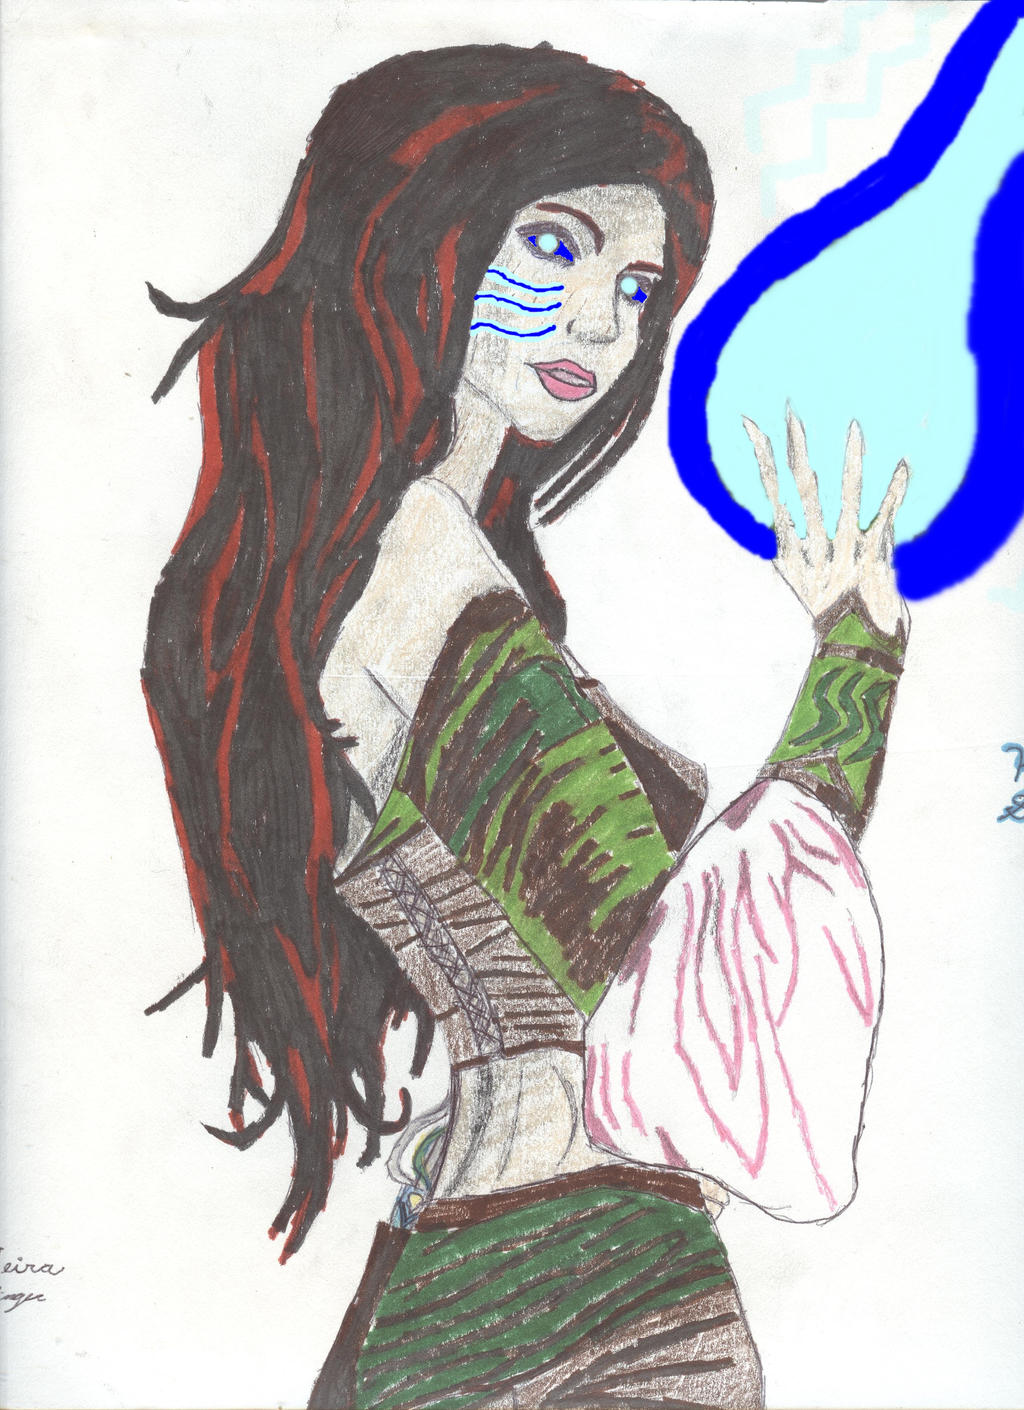 DnD 4e: Kira Stormborn, Primordial Child by Godofwargorgon654